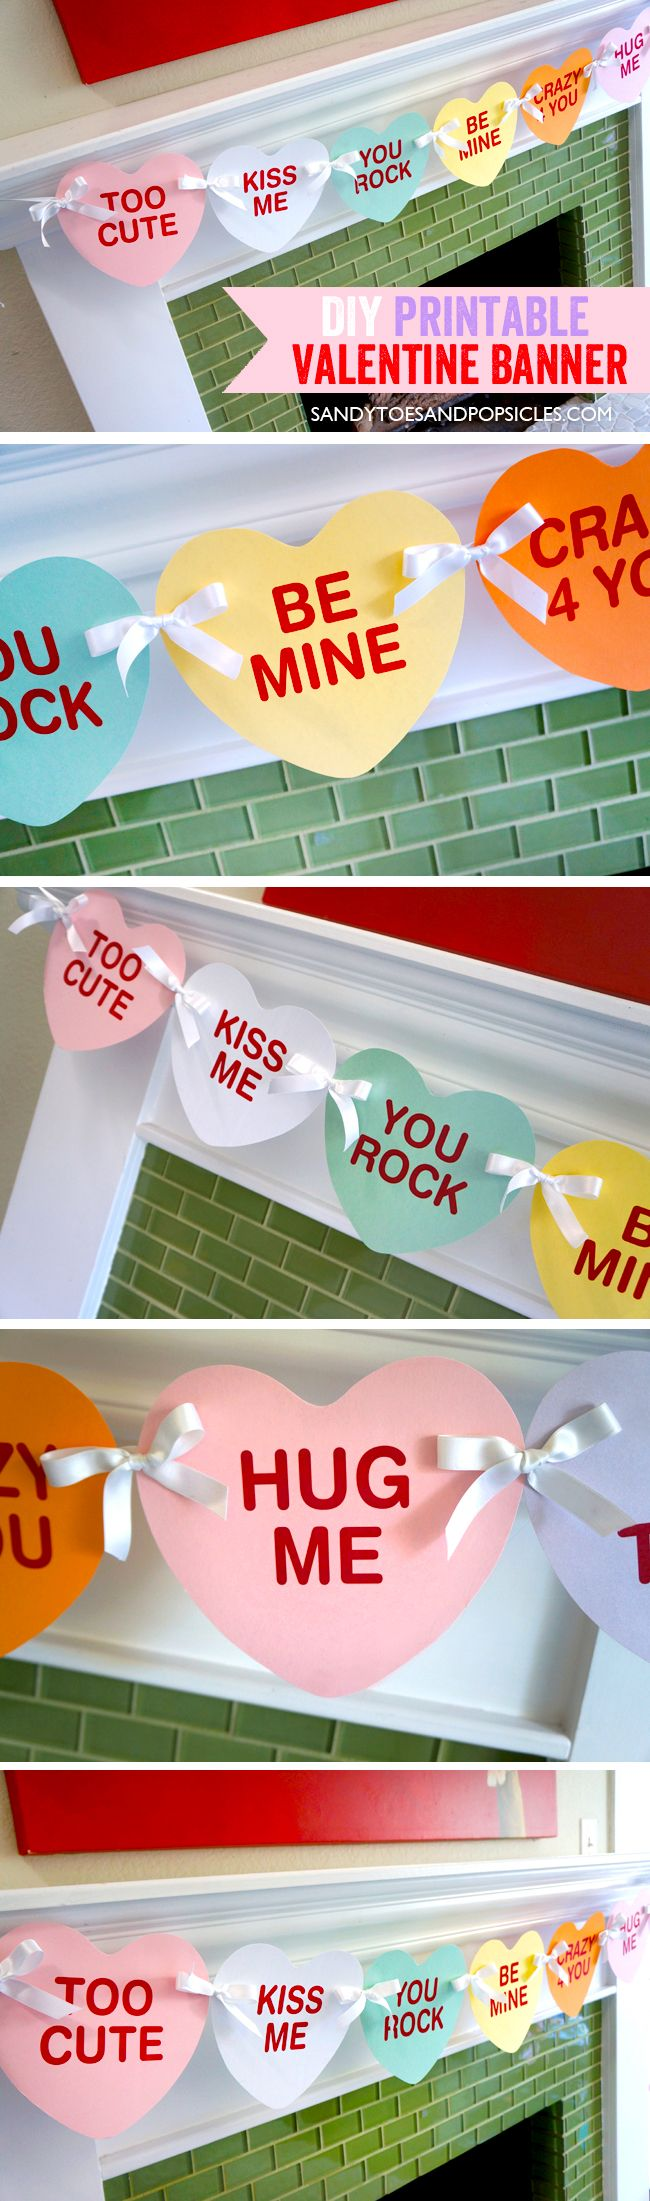 Easy DIY Valentine's Day Printable Banner